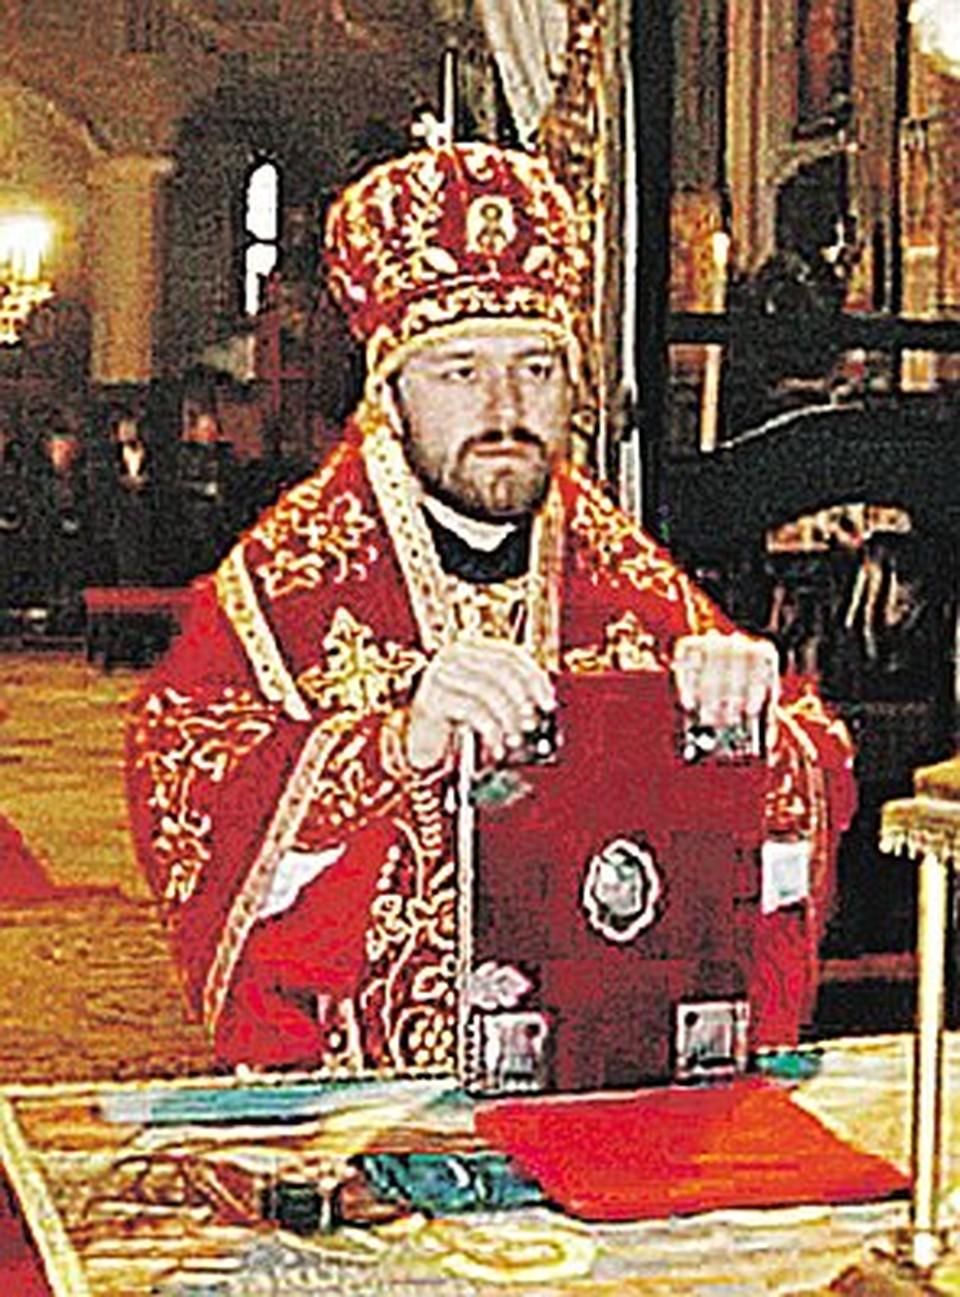 Bishop Hilarion considers Diomid's statements provocative.